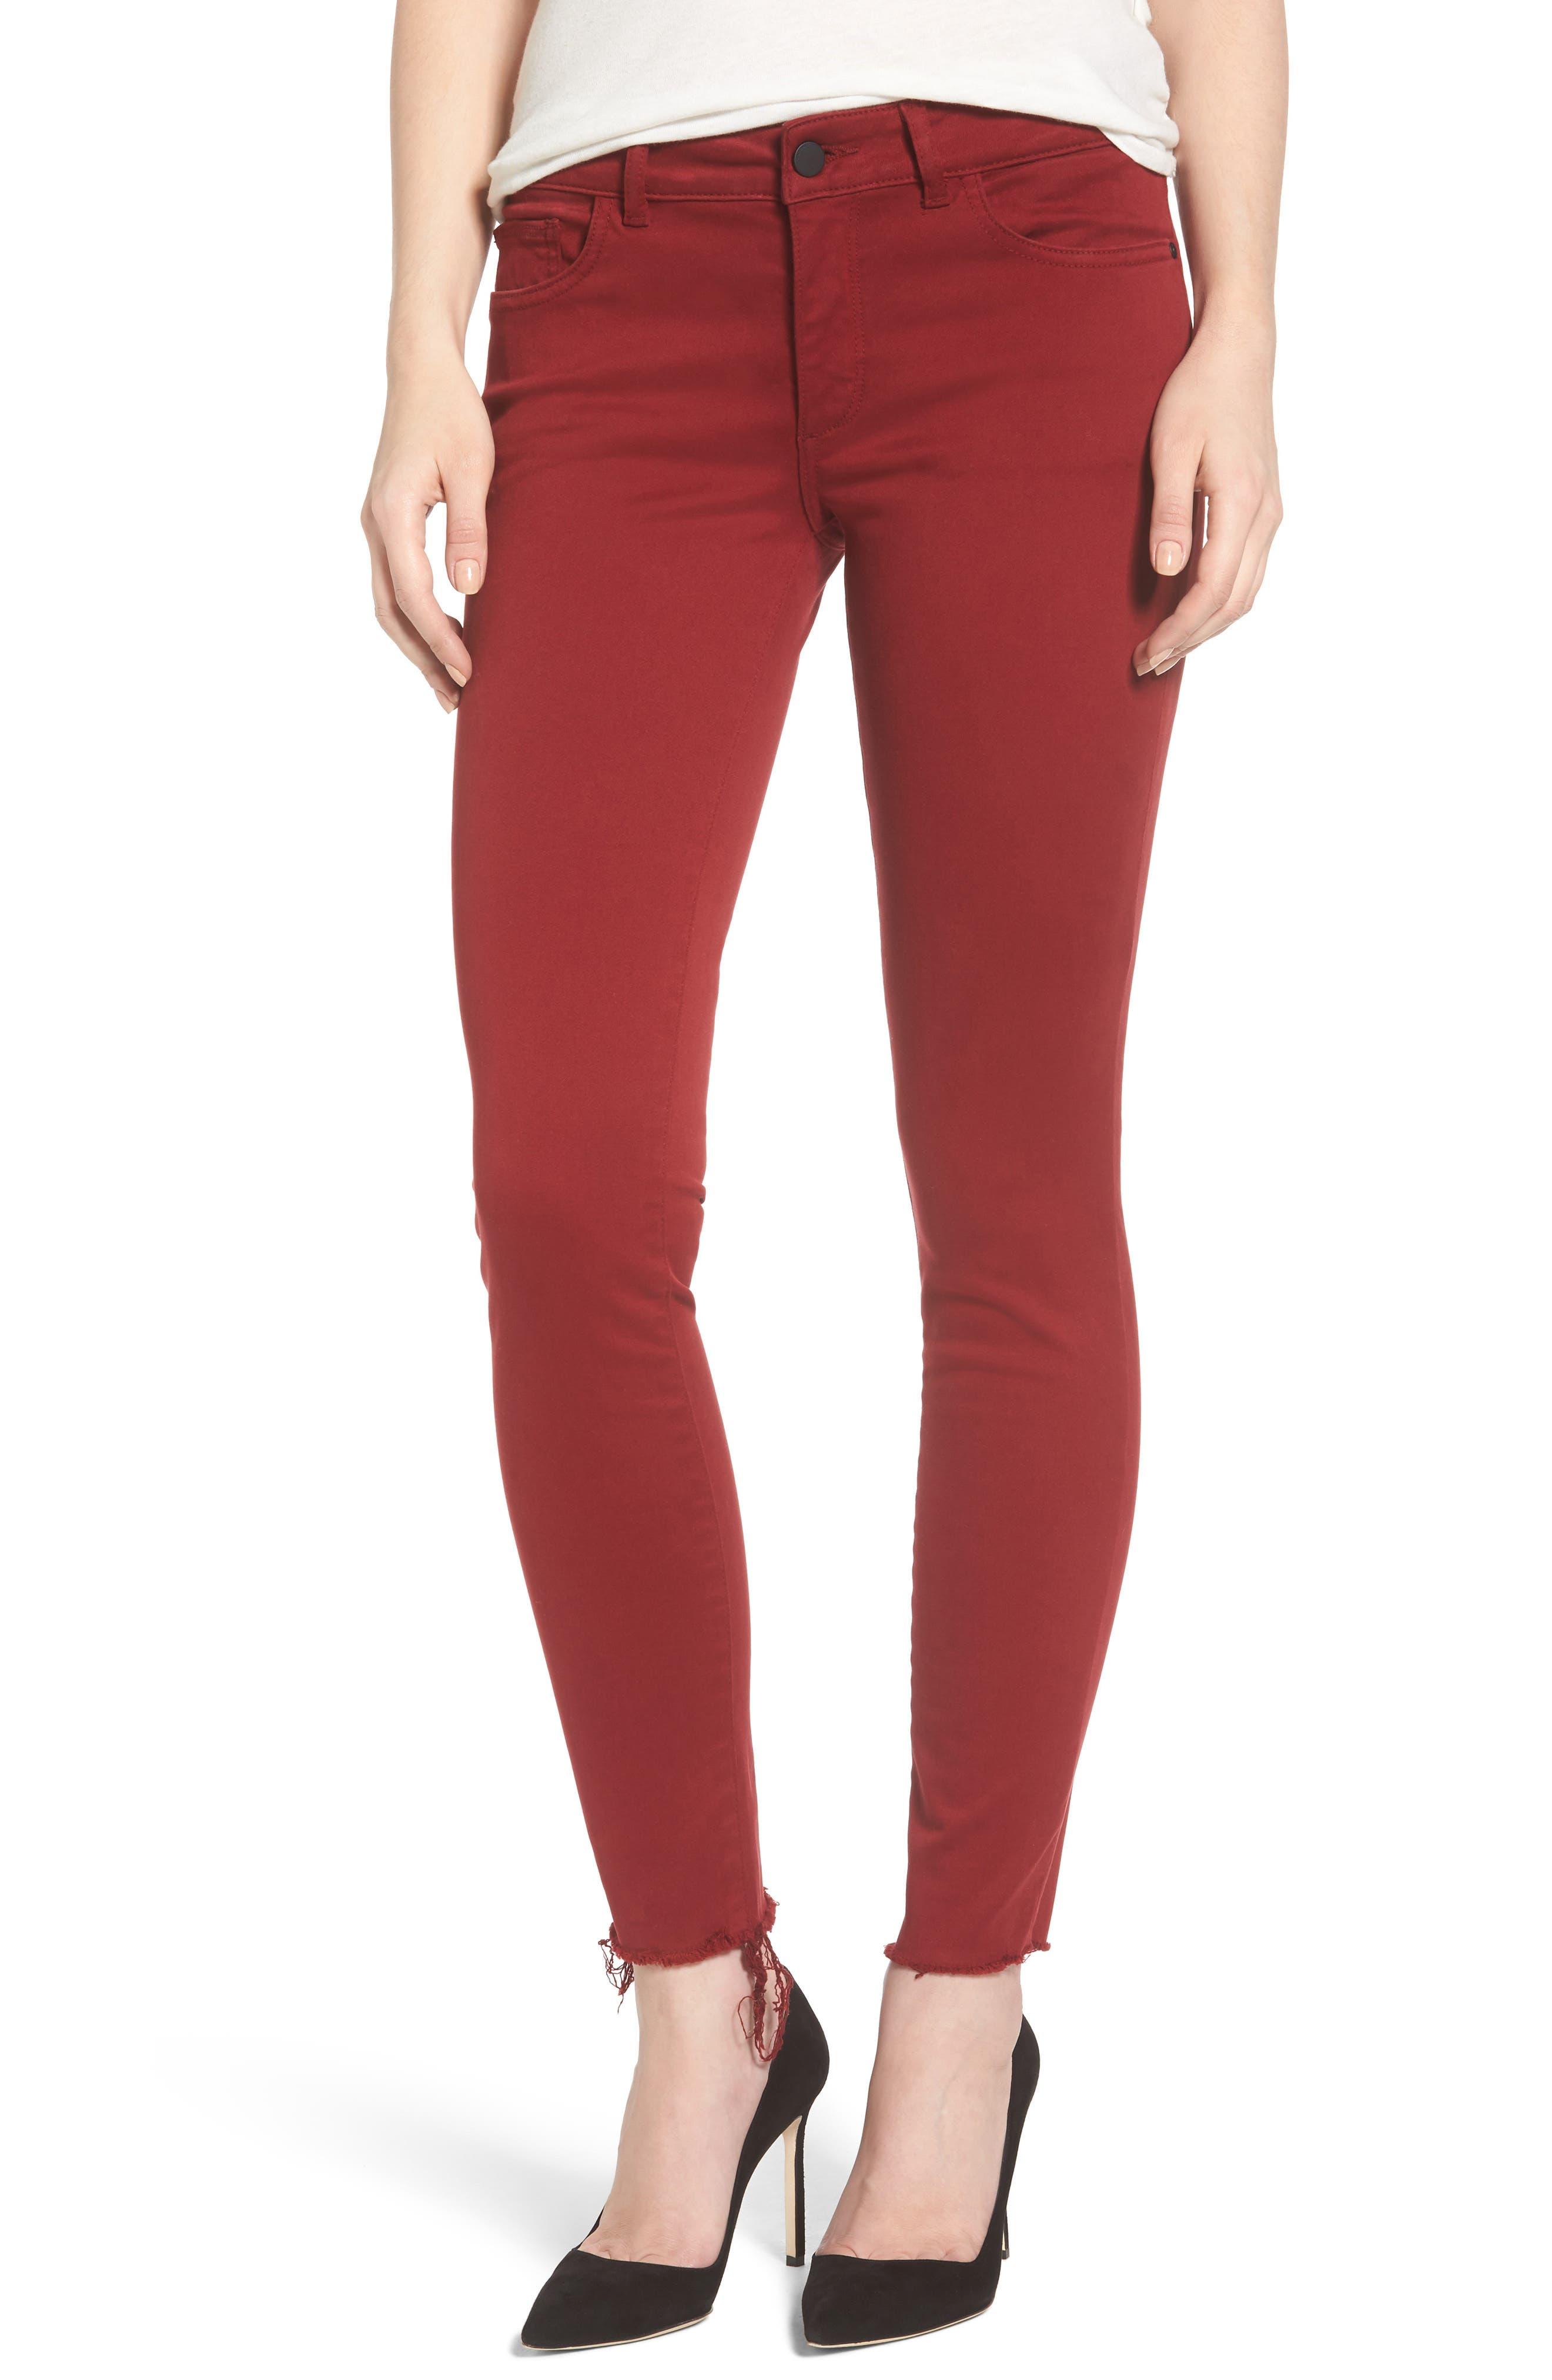 Emma Power Legging Jeans,                             Main thumbnail 1, color,                             609